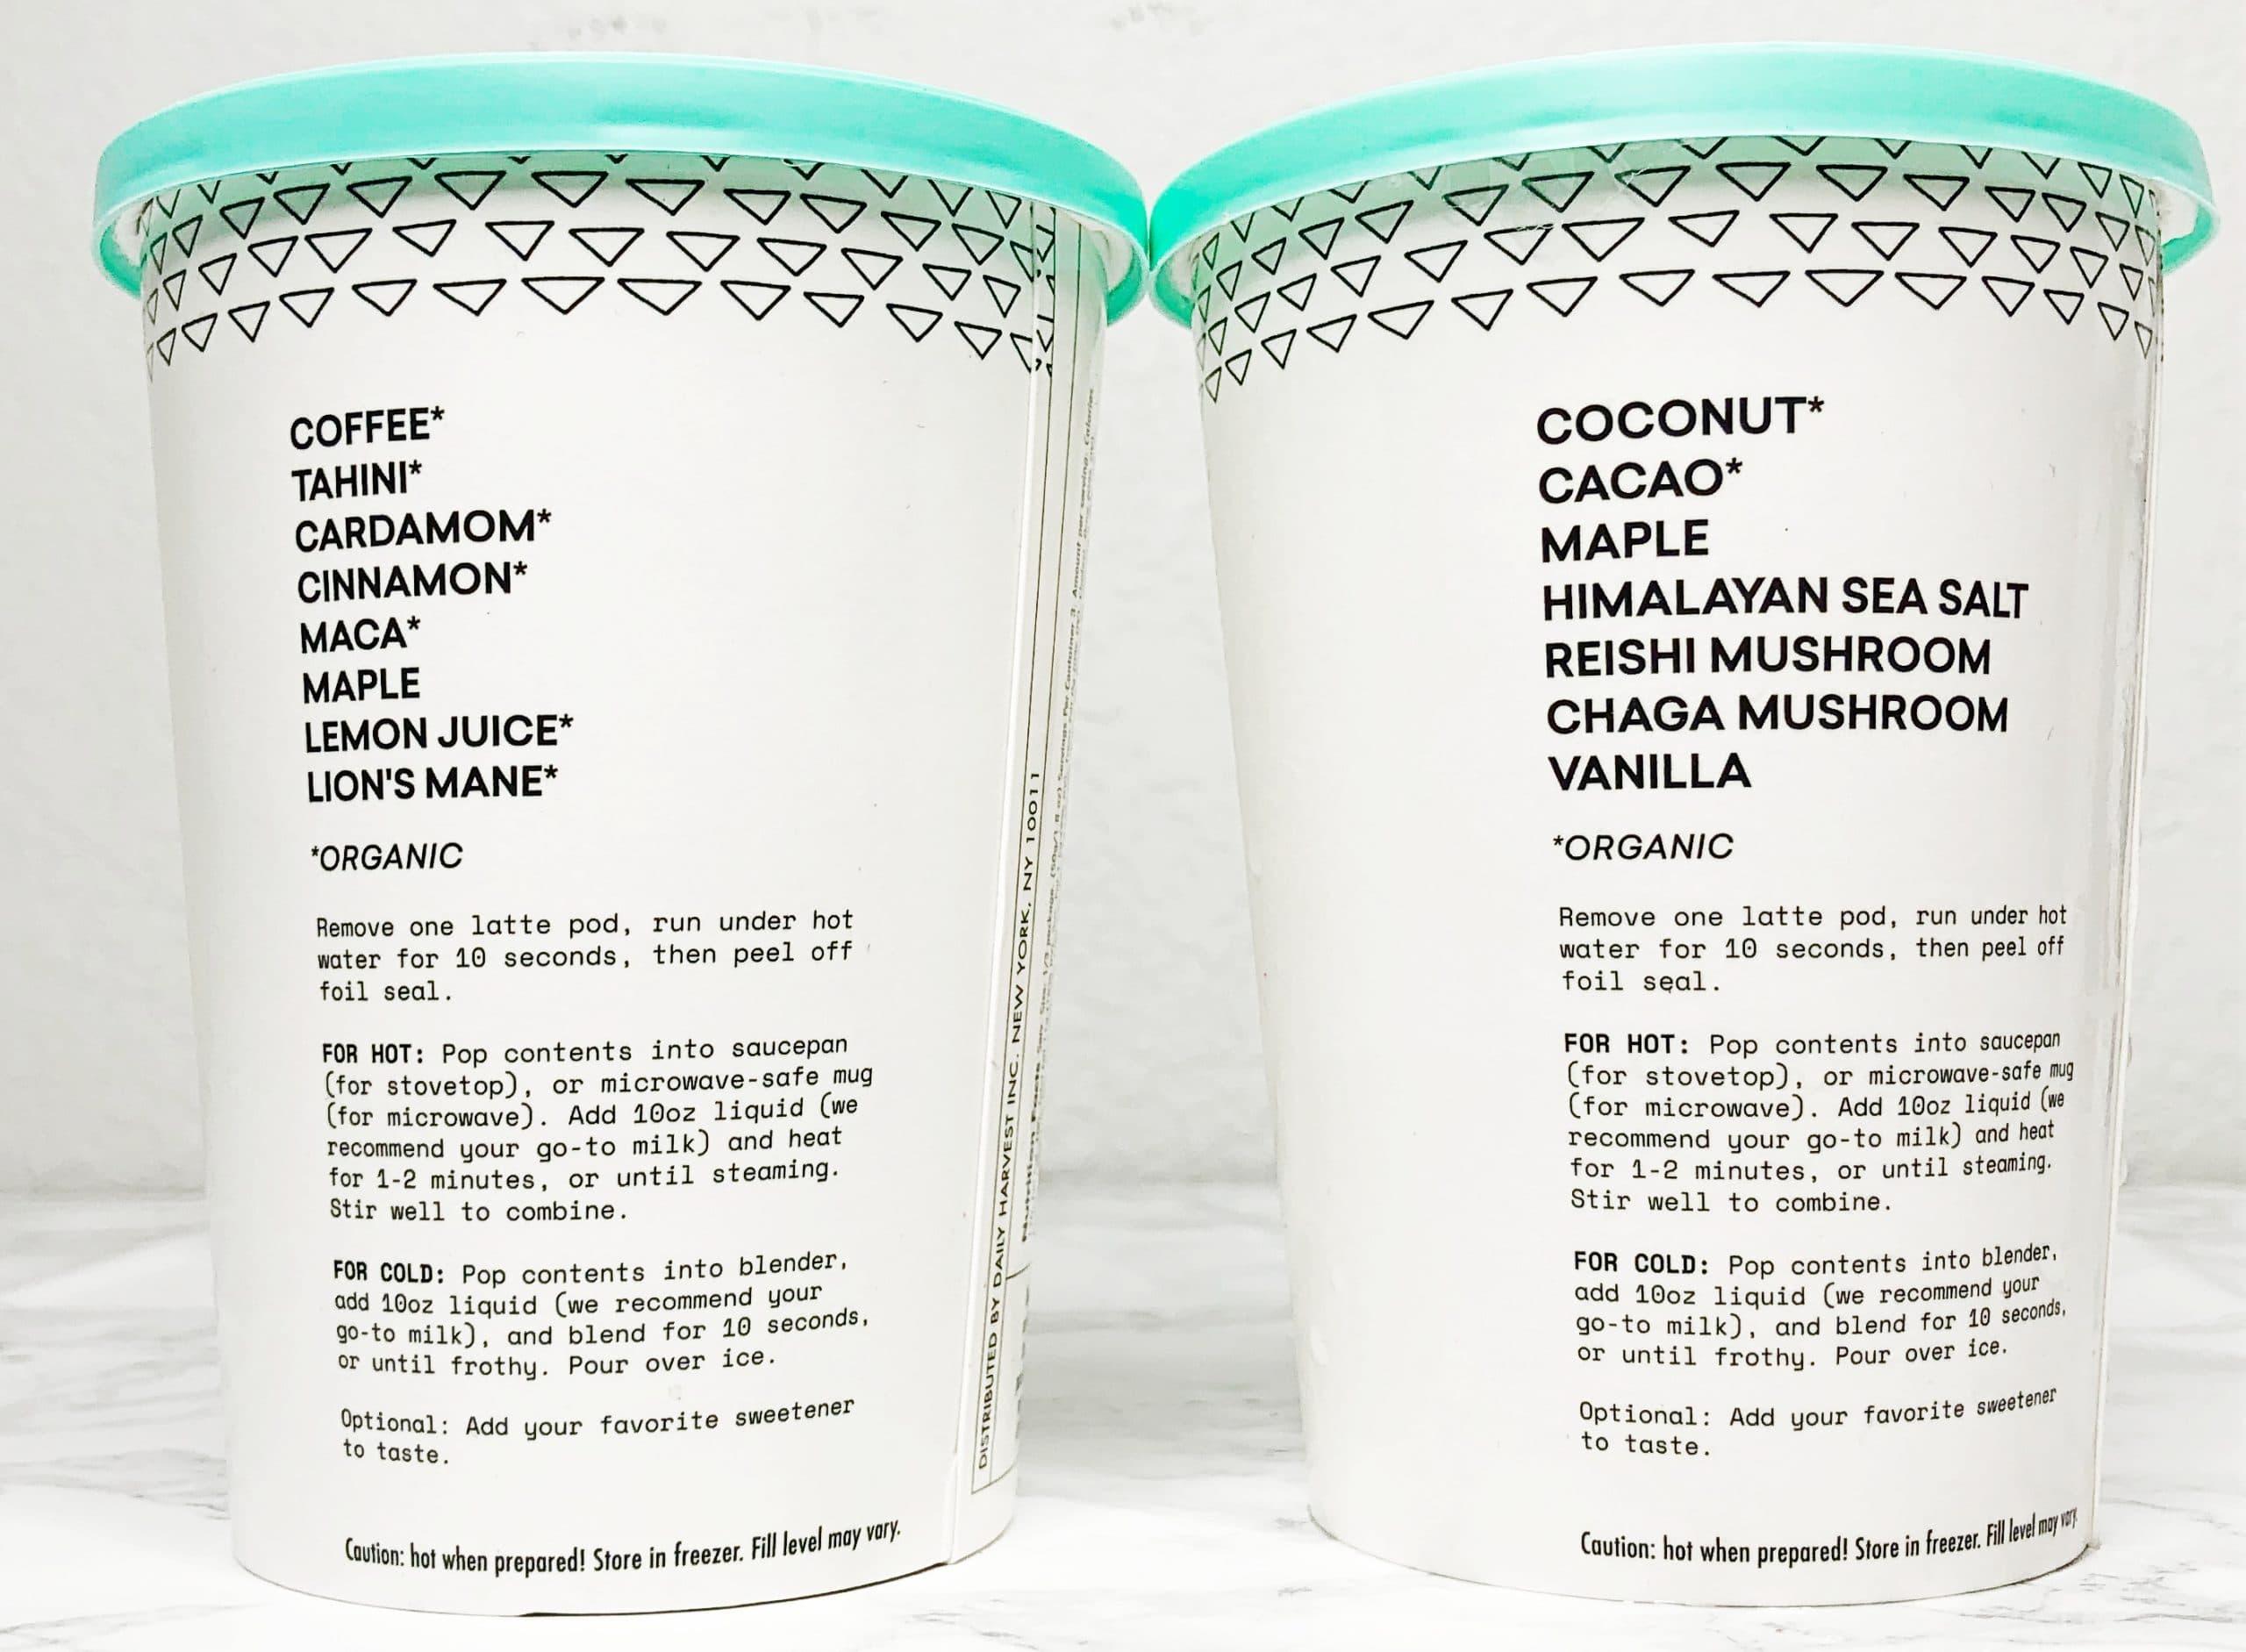 Daily Harvest Ingredients Latte